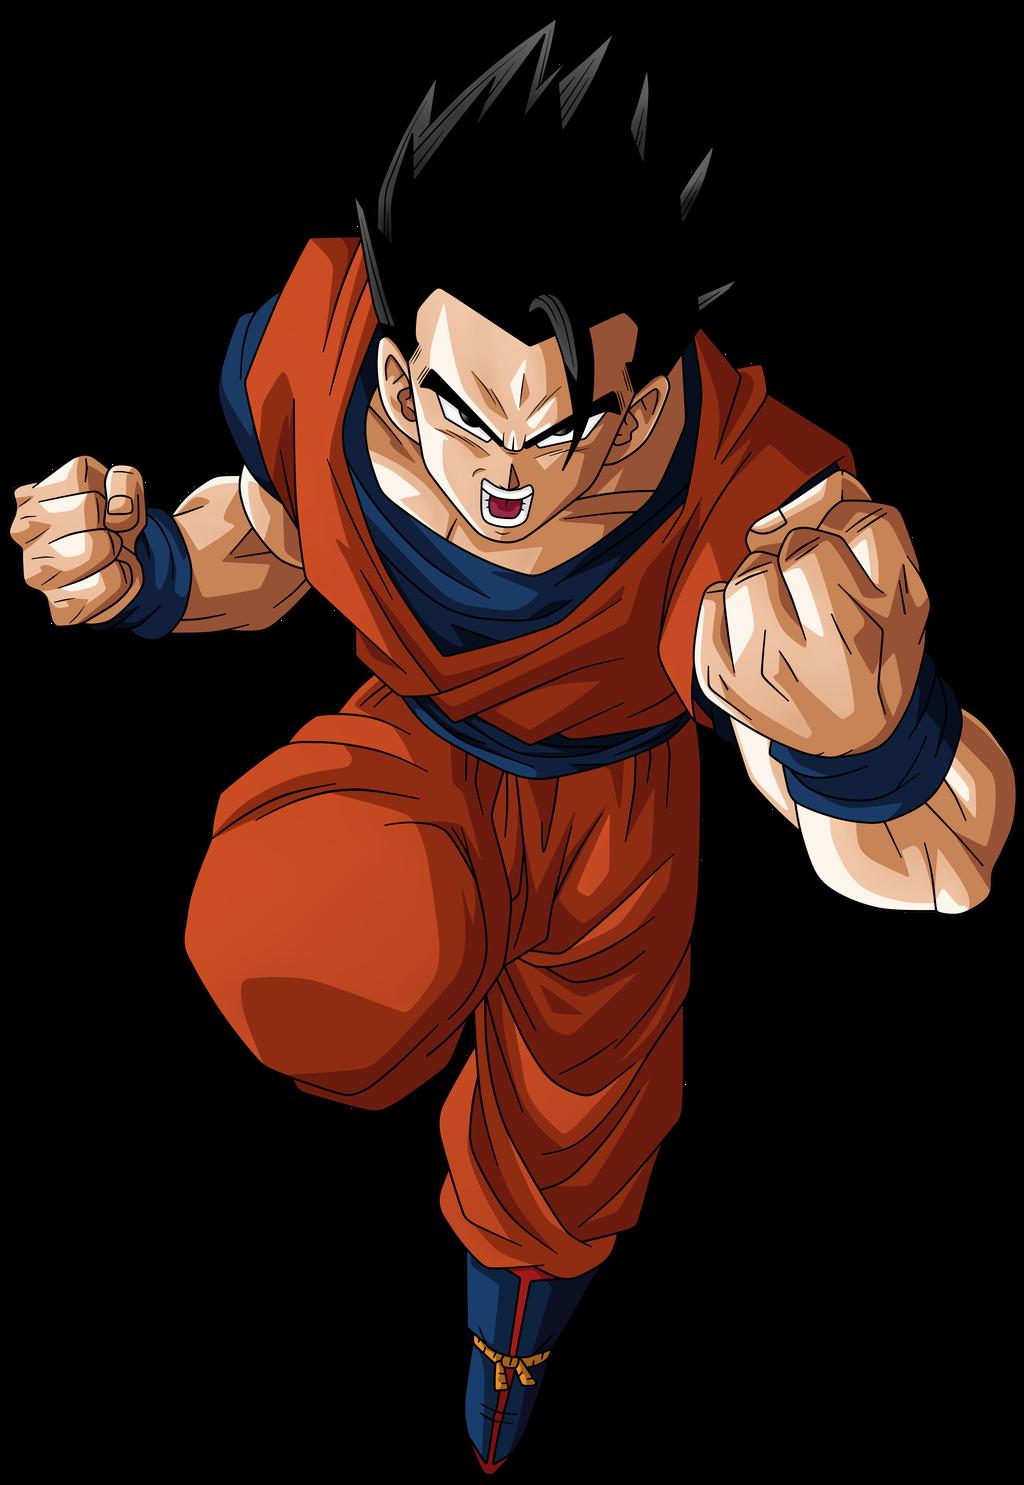 Gohan Definitivo By Cholo15art On Deviantart Anime Dragon Ball Super Dragon Ball Super Manga Dragon Ball Artwork